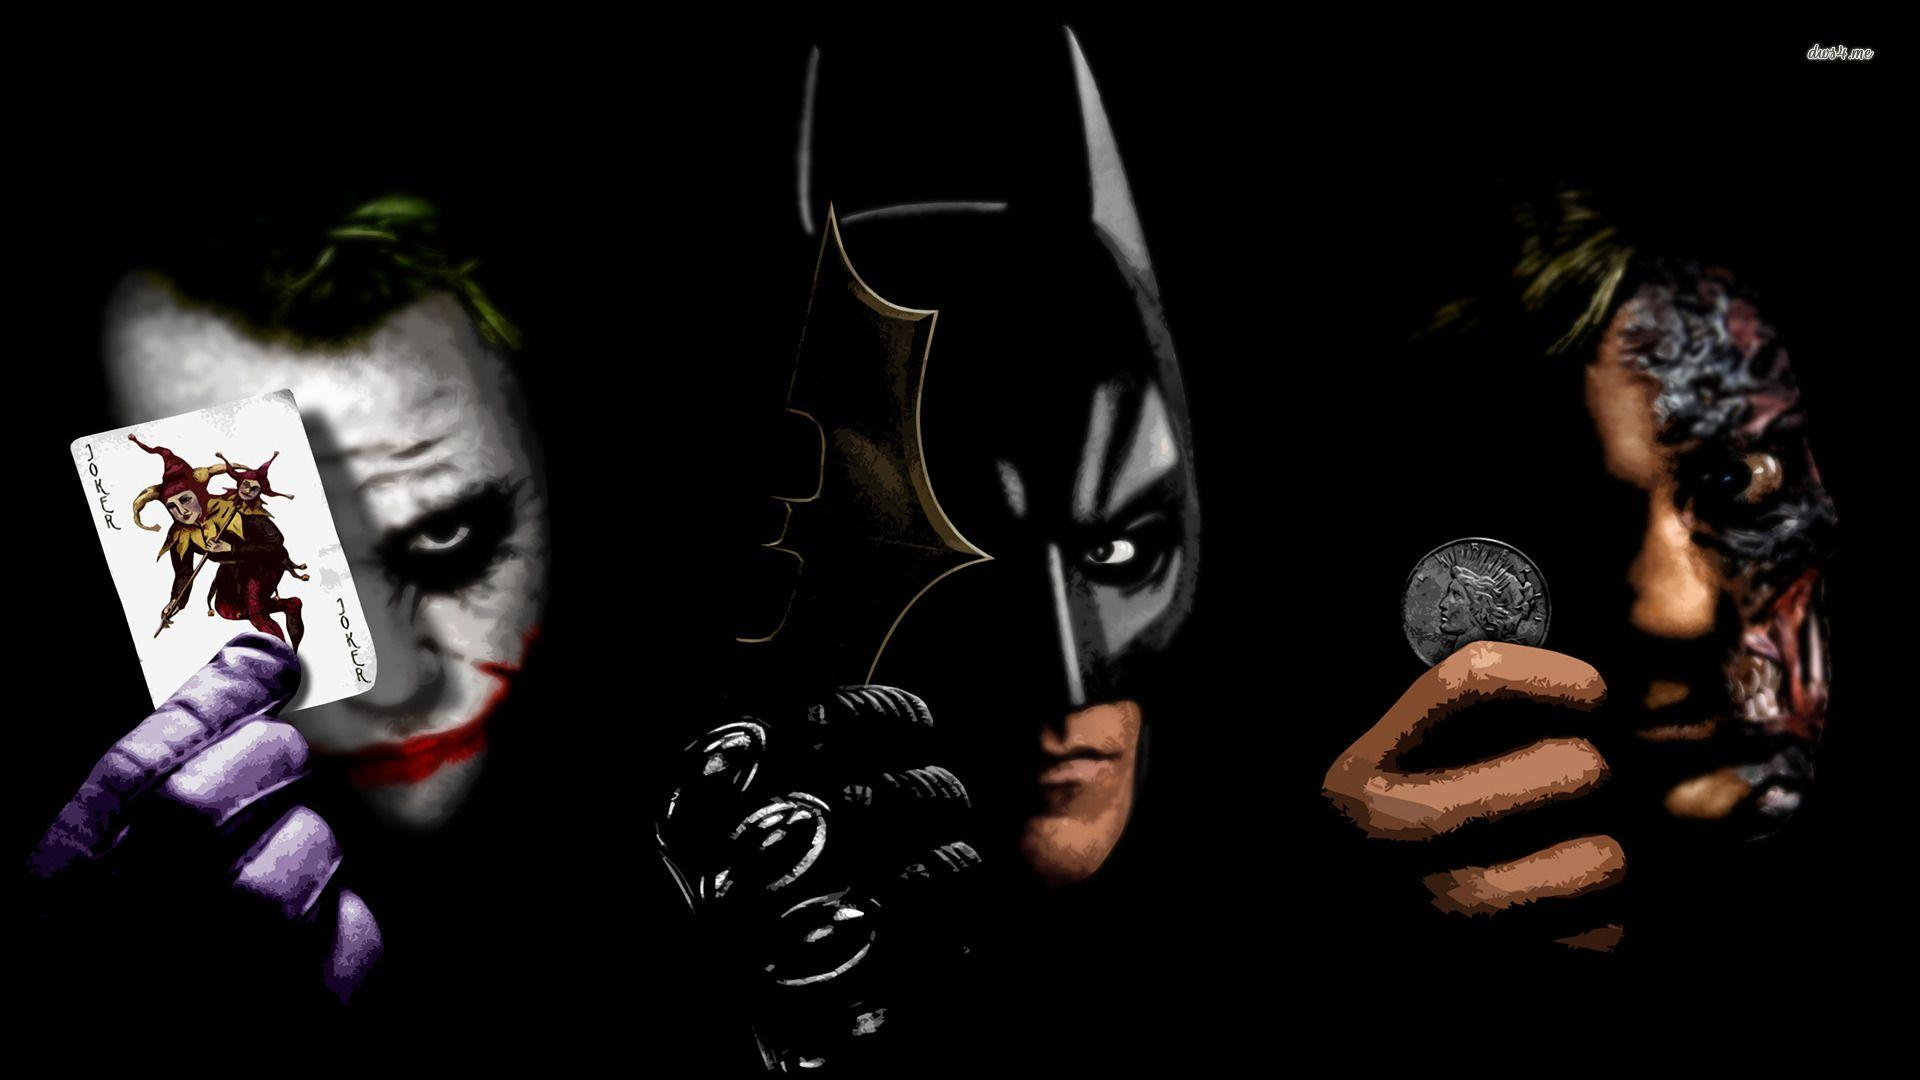 Joker, Batman and Two Face wallpaper - Movie wallpapers - #